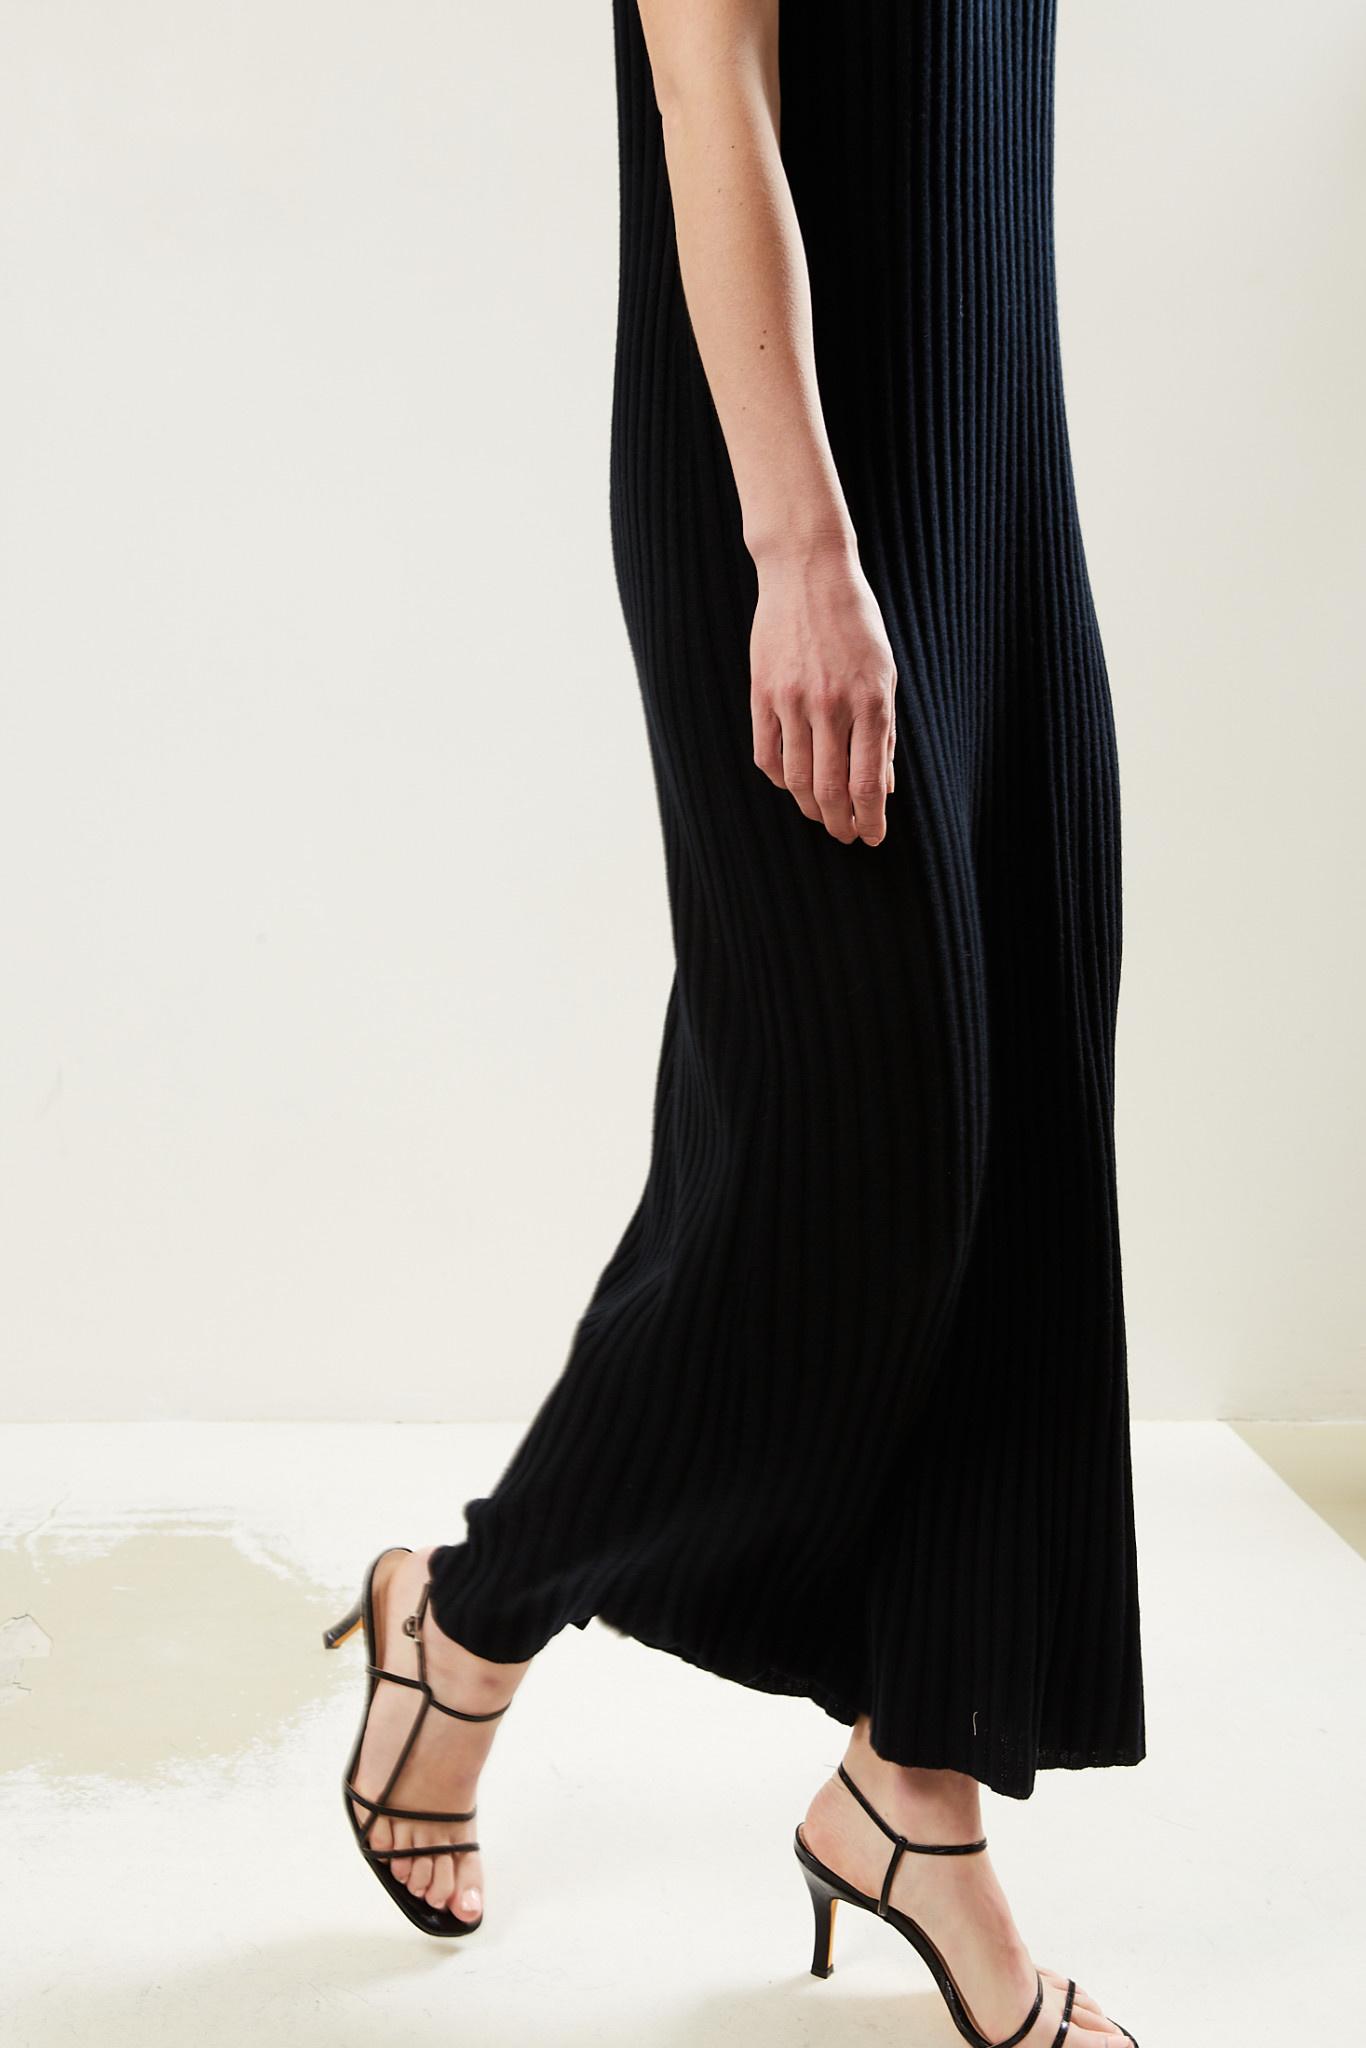 loulou studio - Andrott dress